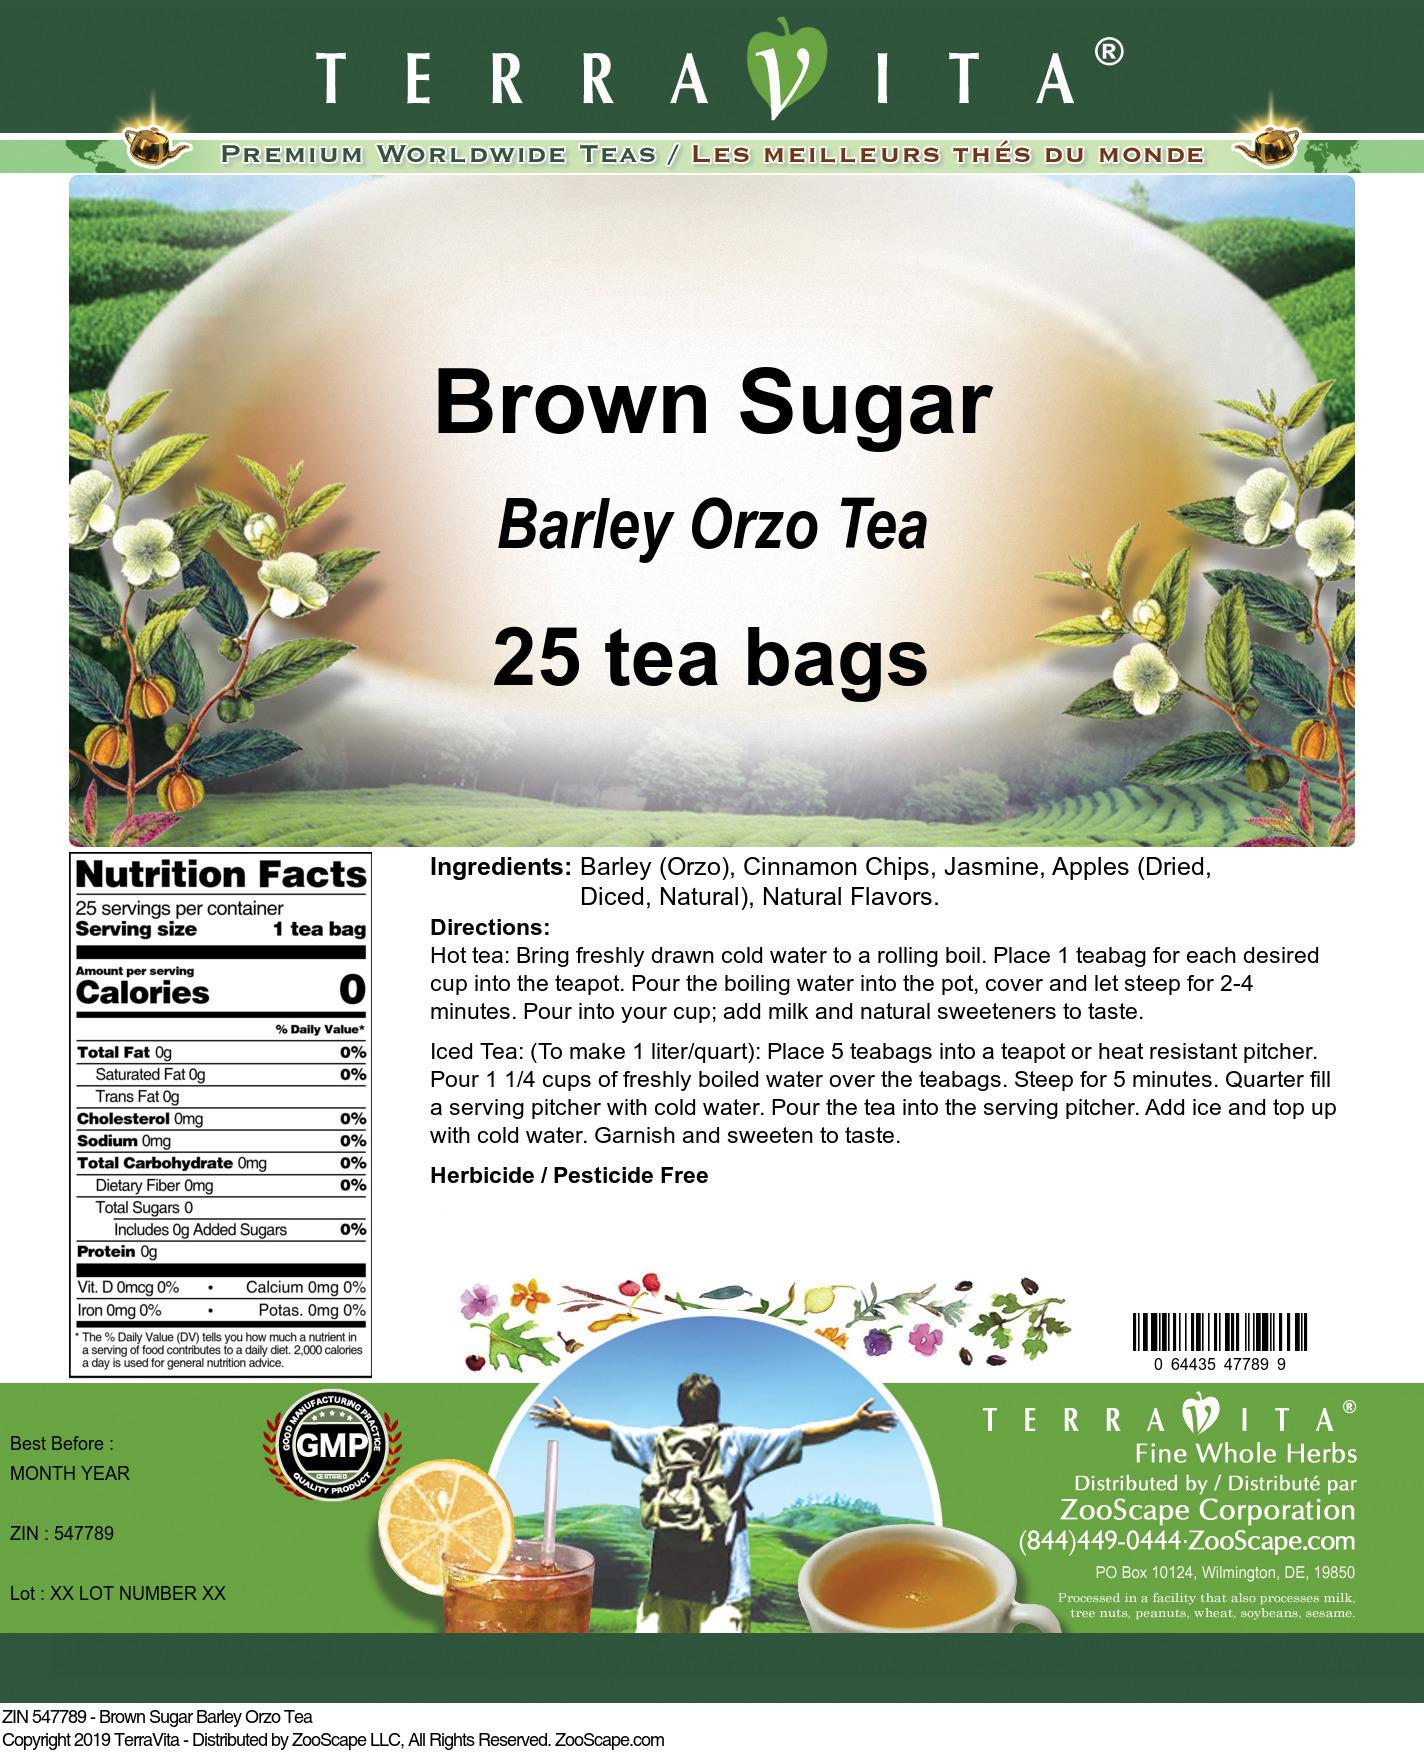 Brown Sugar Barley Orzo Tea